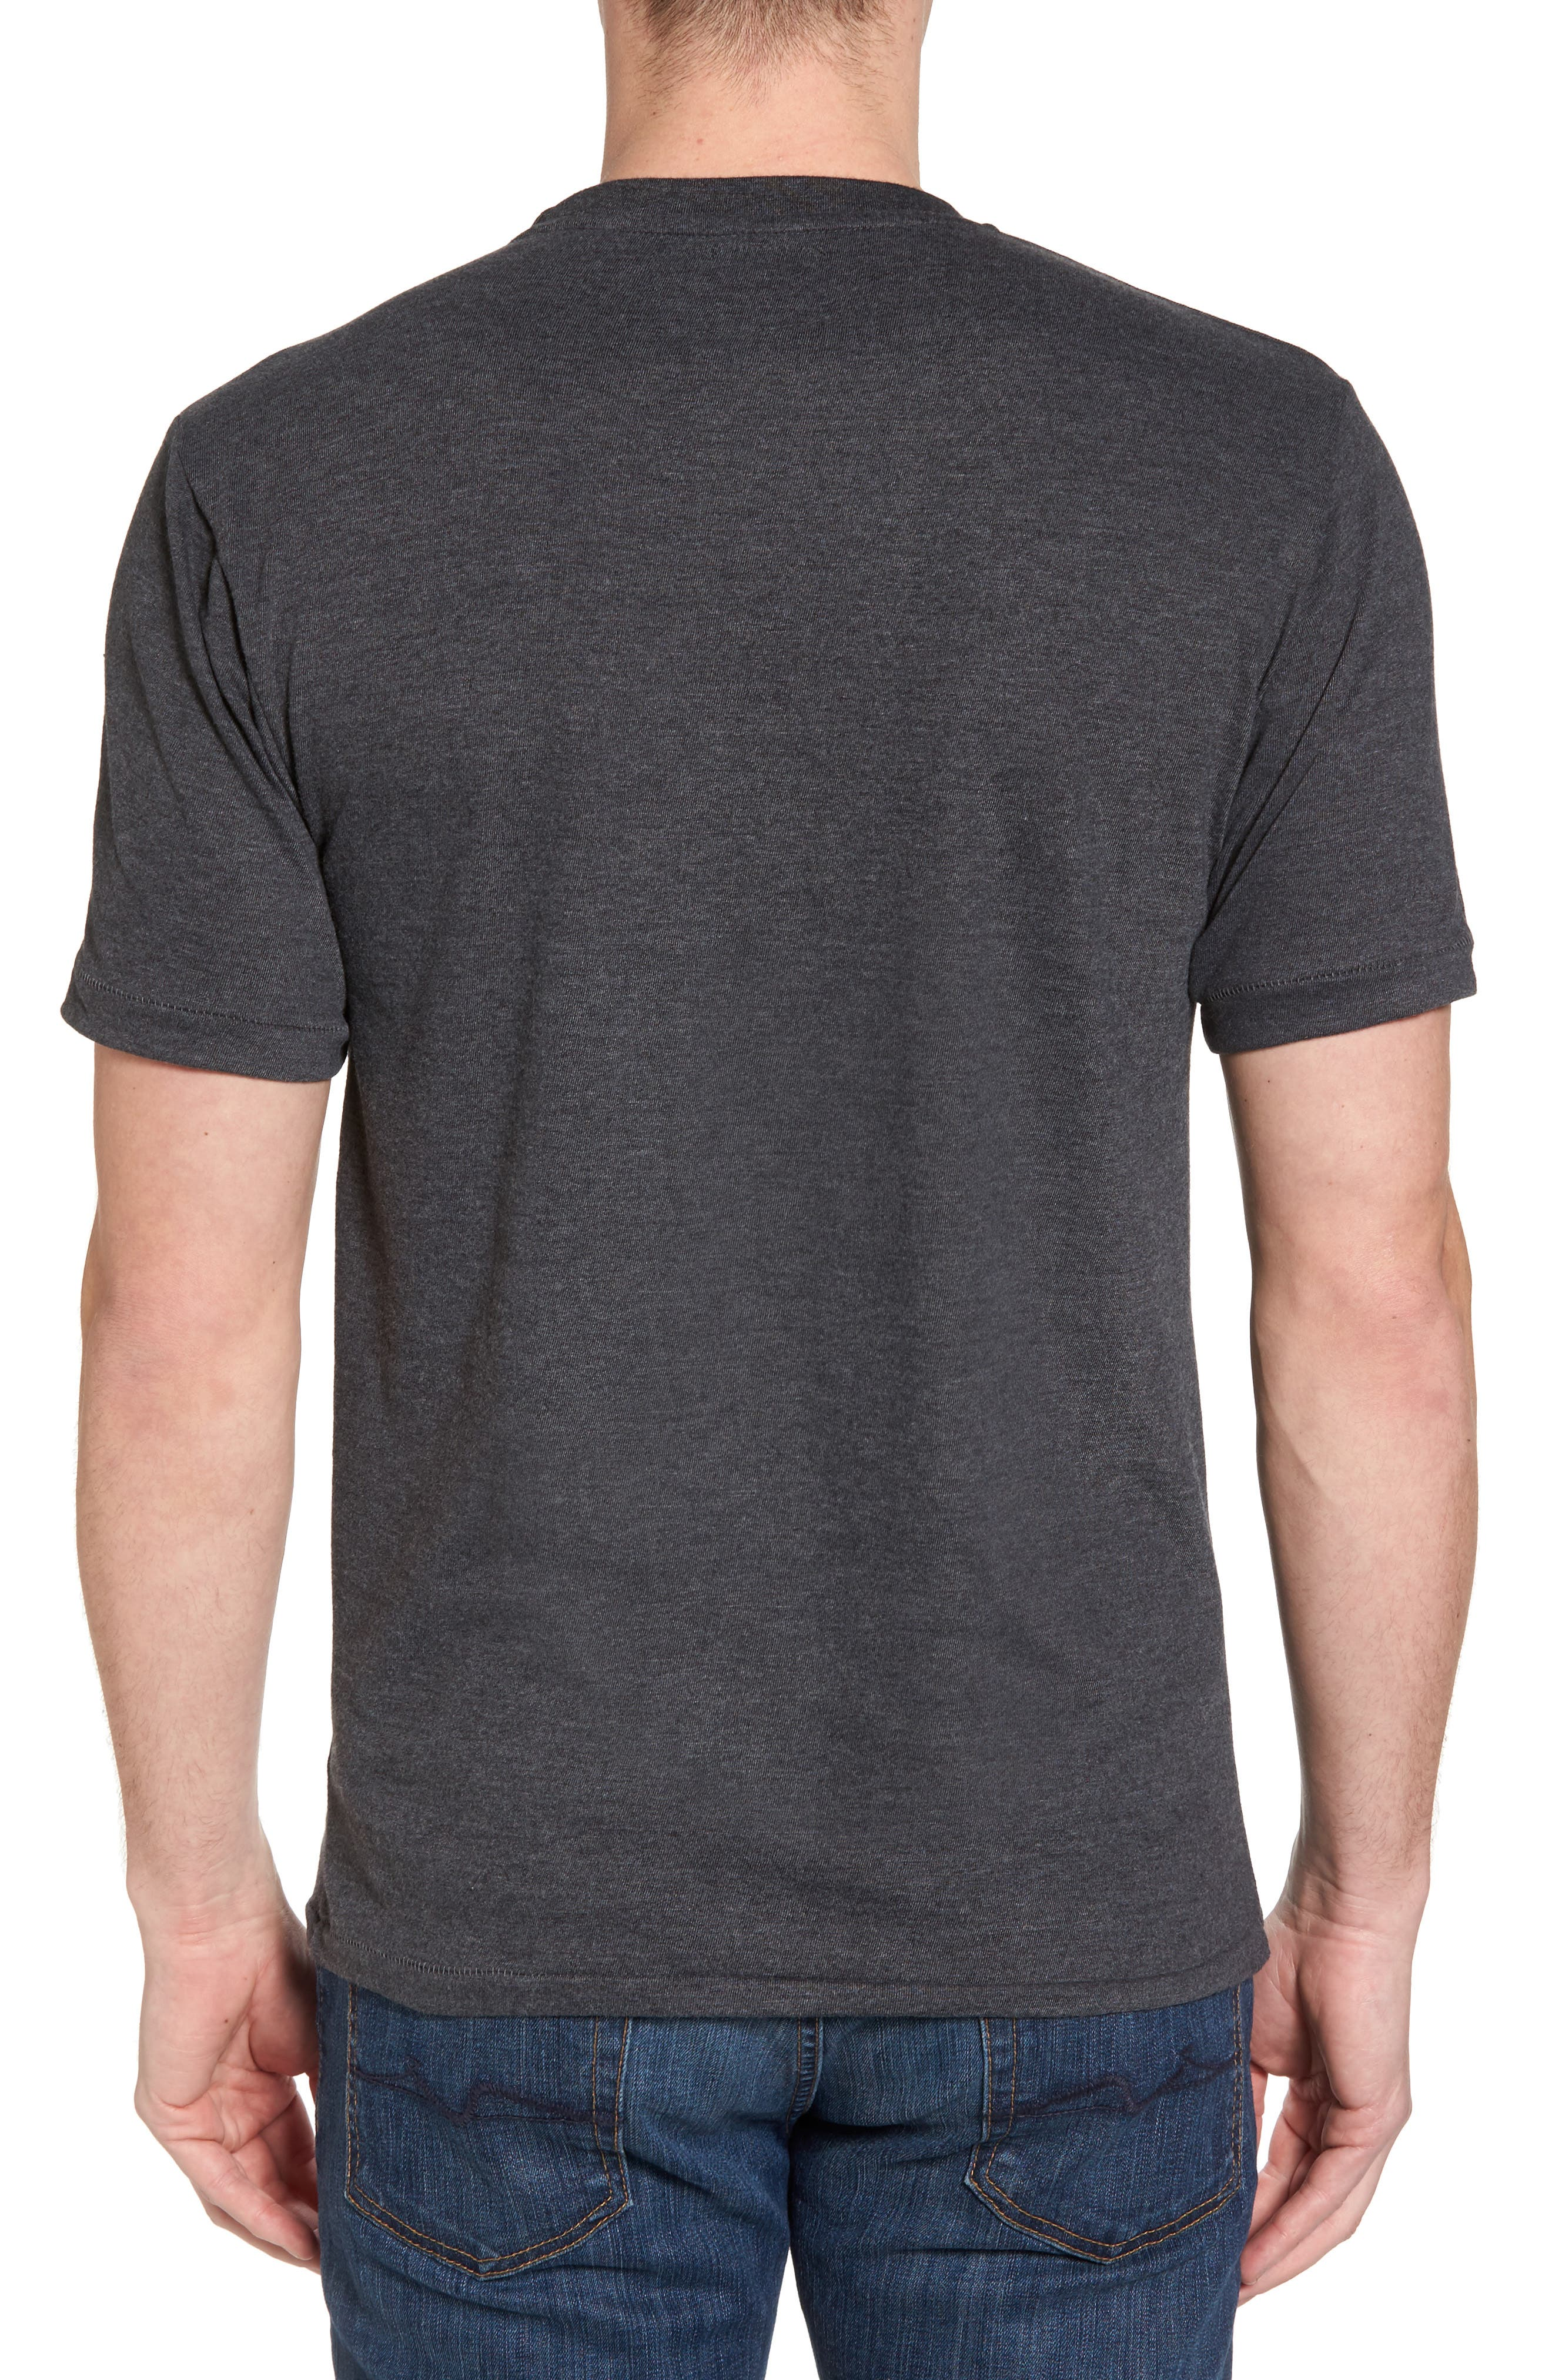 Hillwood Kings T-Shirt,                             Alternate thumbnail 2, color,                             001